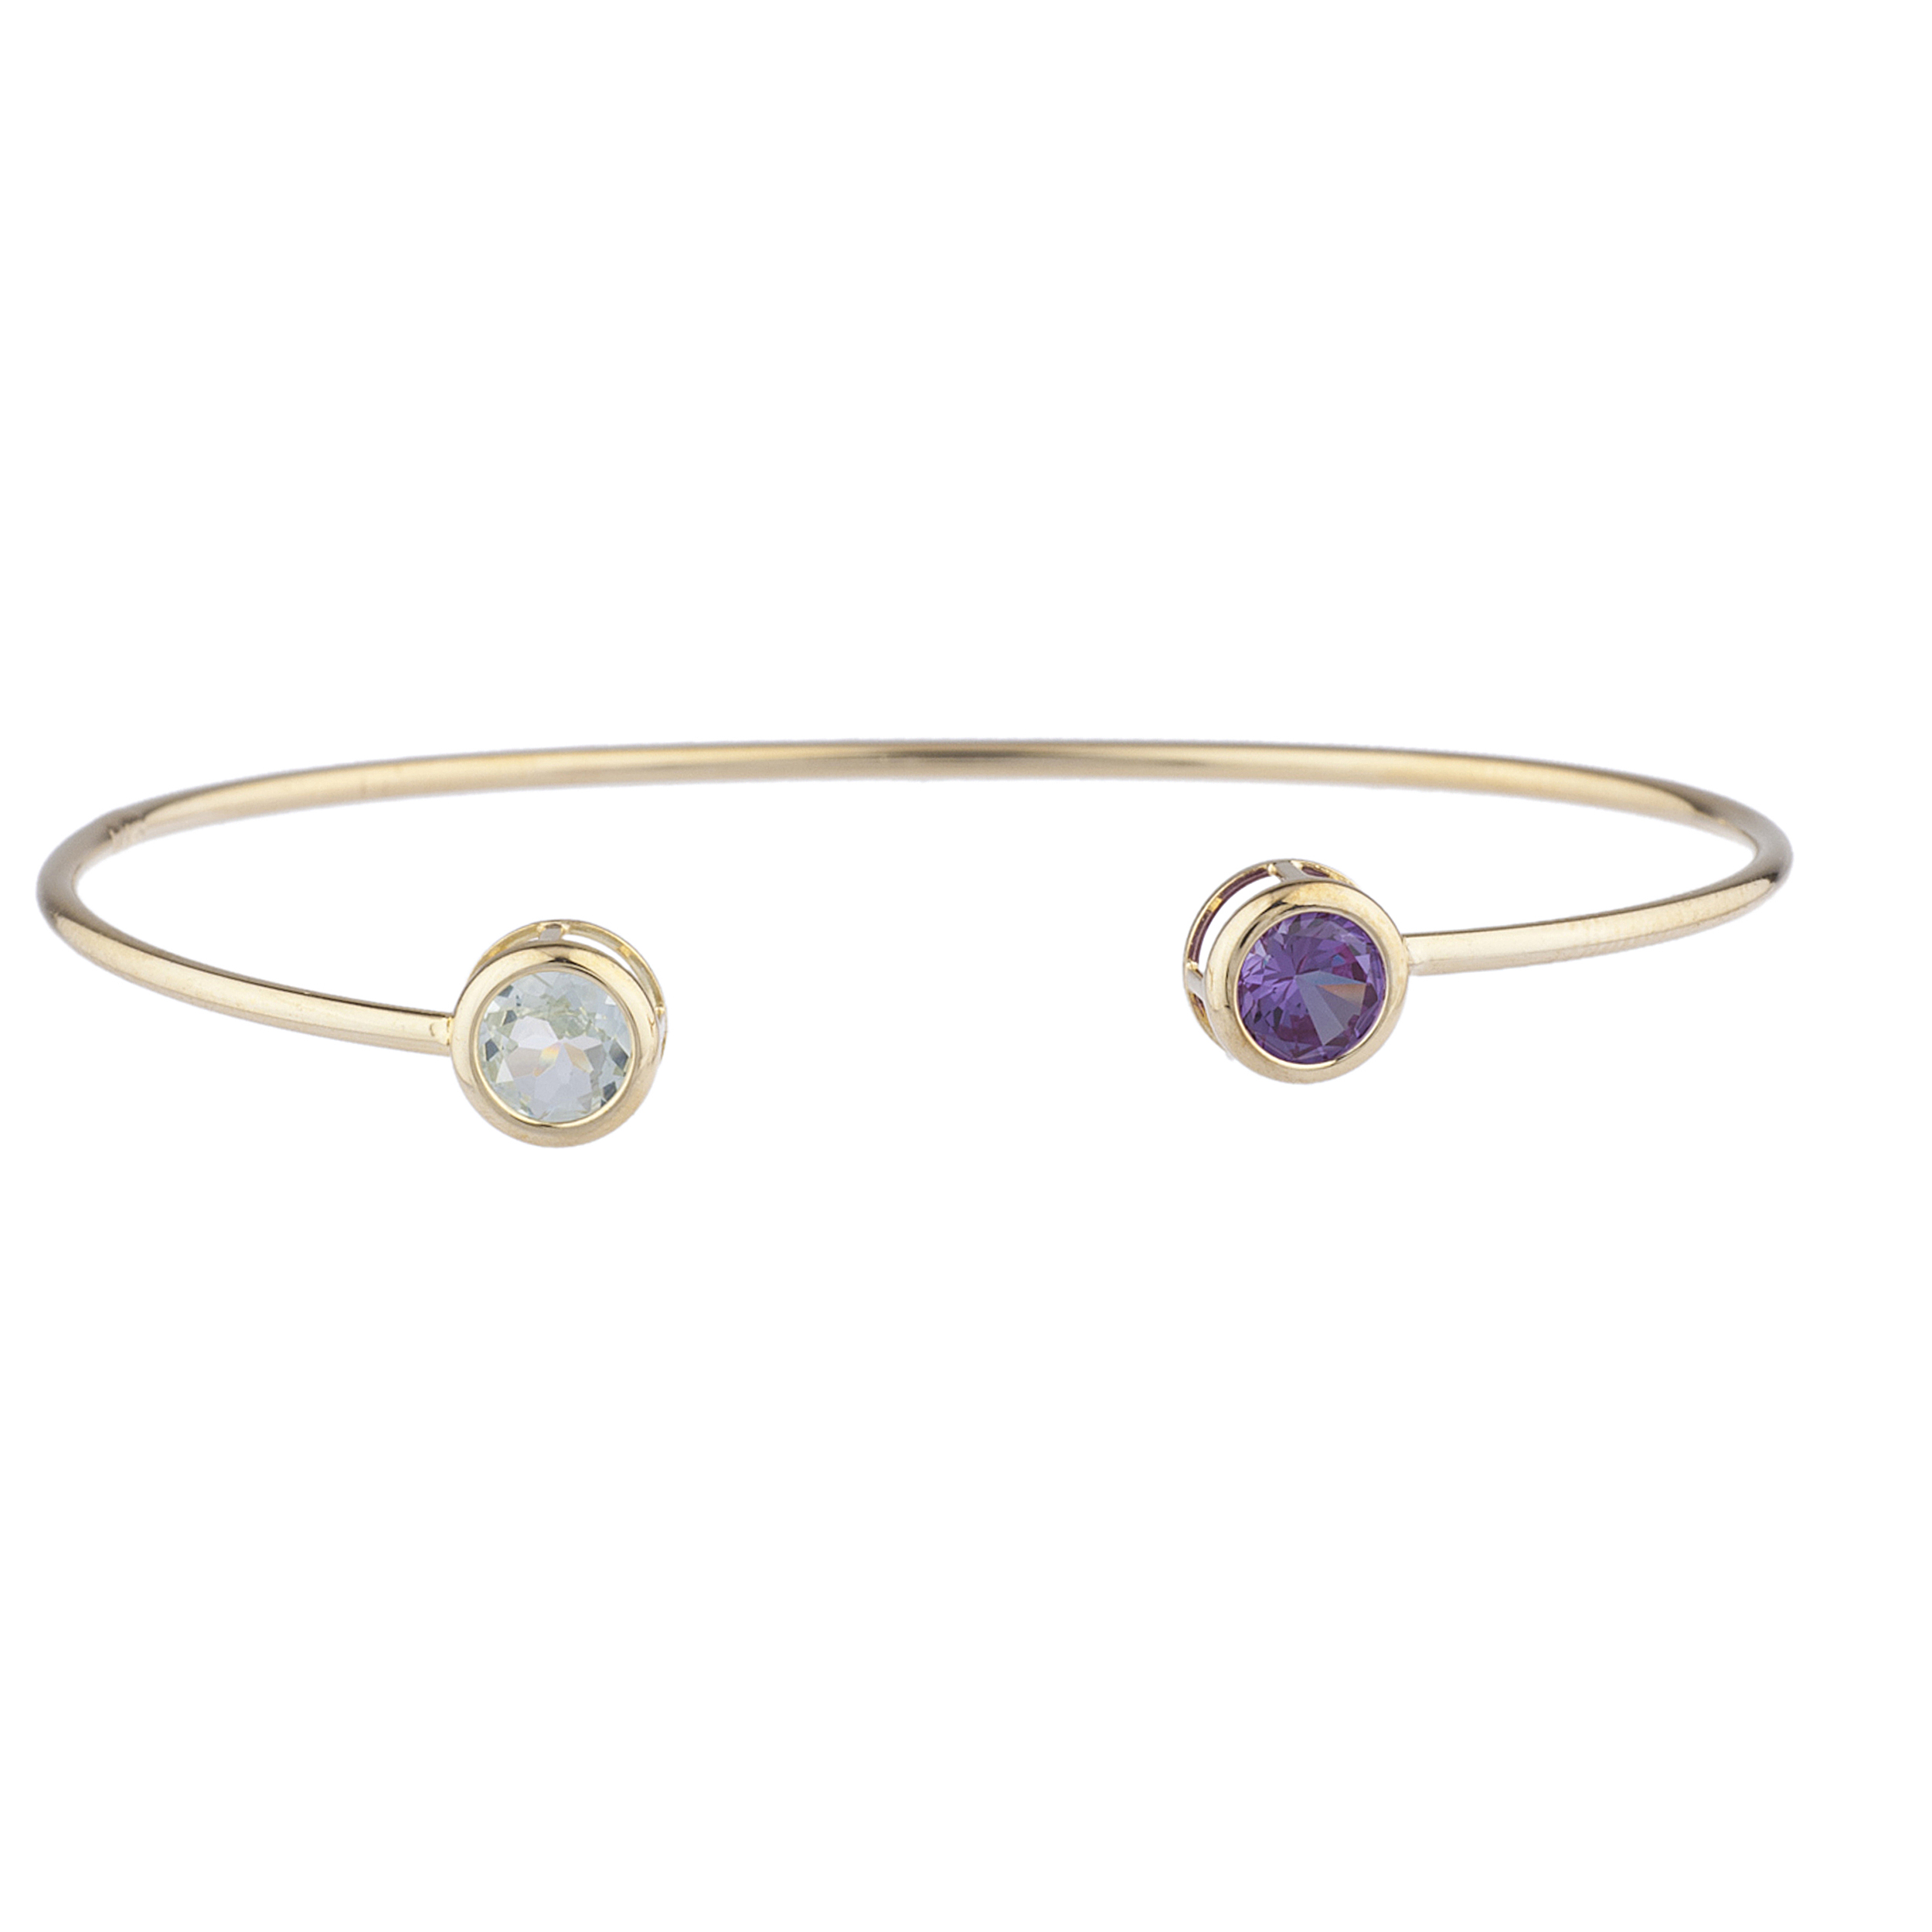 Genuine Aquamarine & Alexandrite Round Bezel Bangle Bracelet 14Kt Yellow Gold Plated Over .925 Sterling Silver by Elizabeth Jewelry Inc